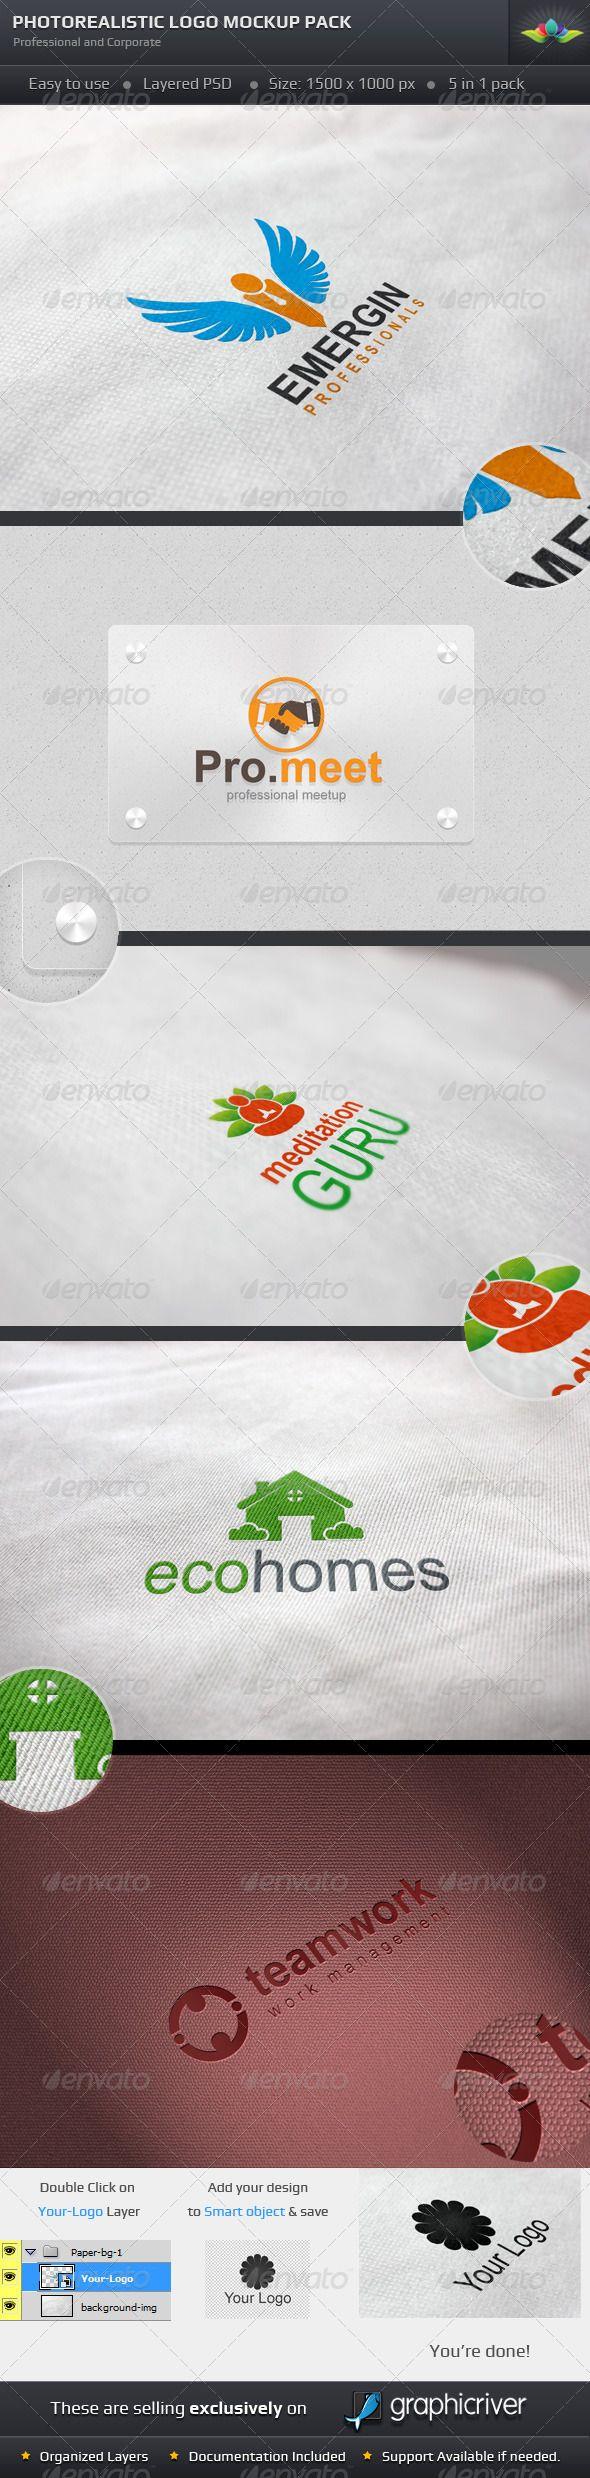 Photorealistic Logo Mockup Pack 37 best Graphics